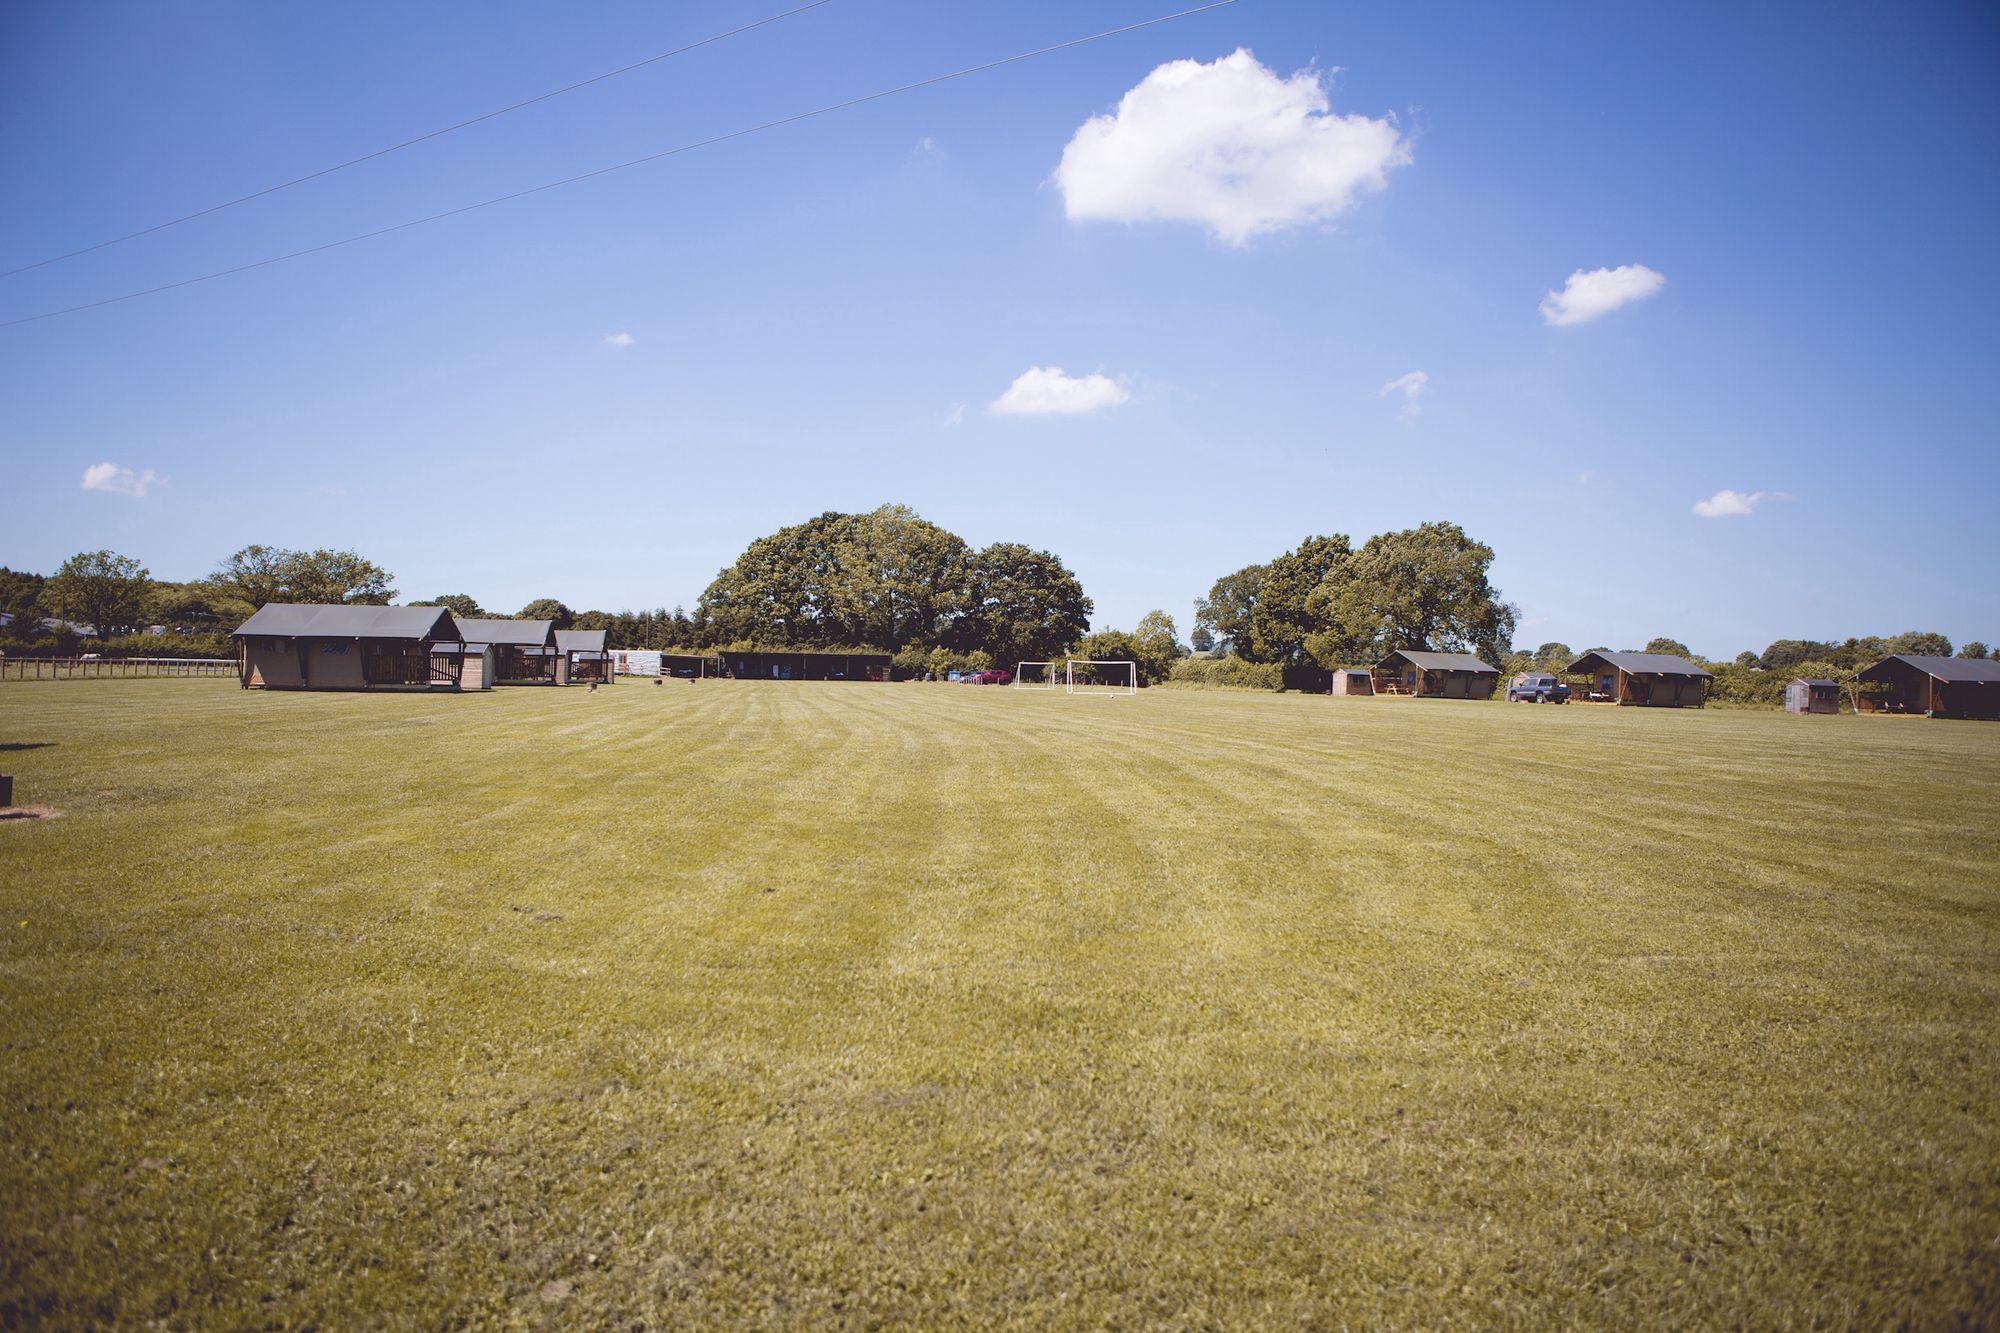 Campsites in Worcestershire